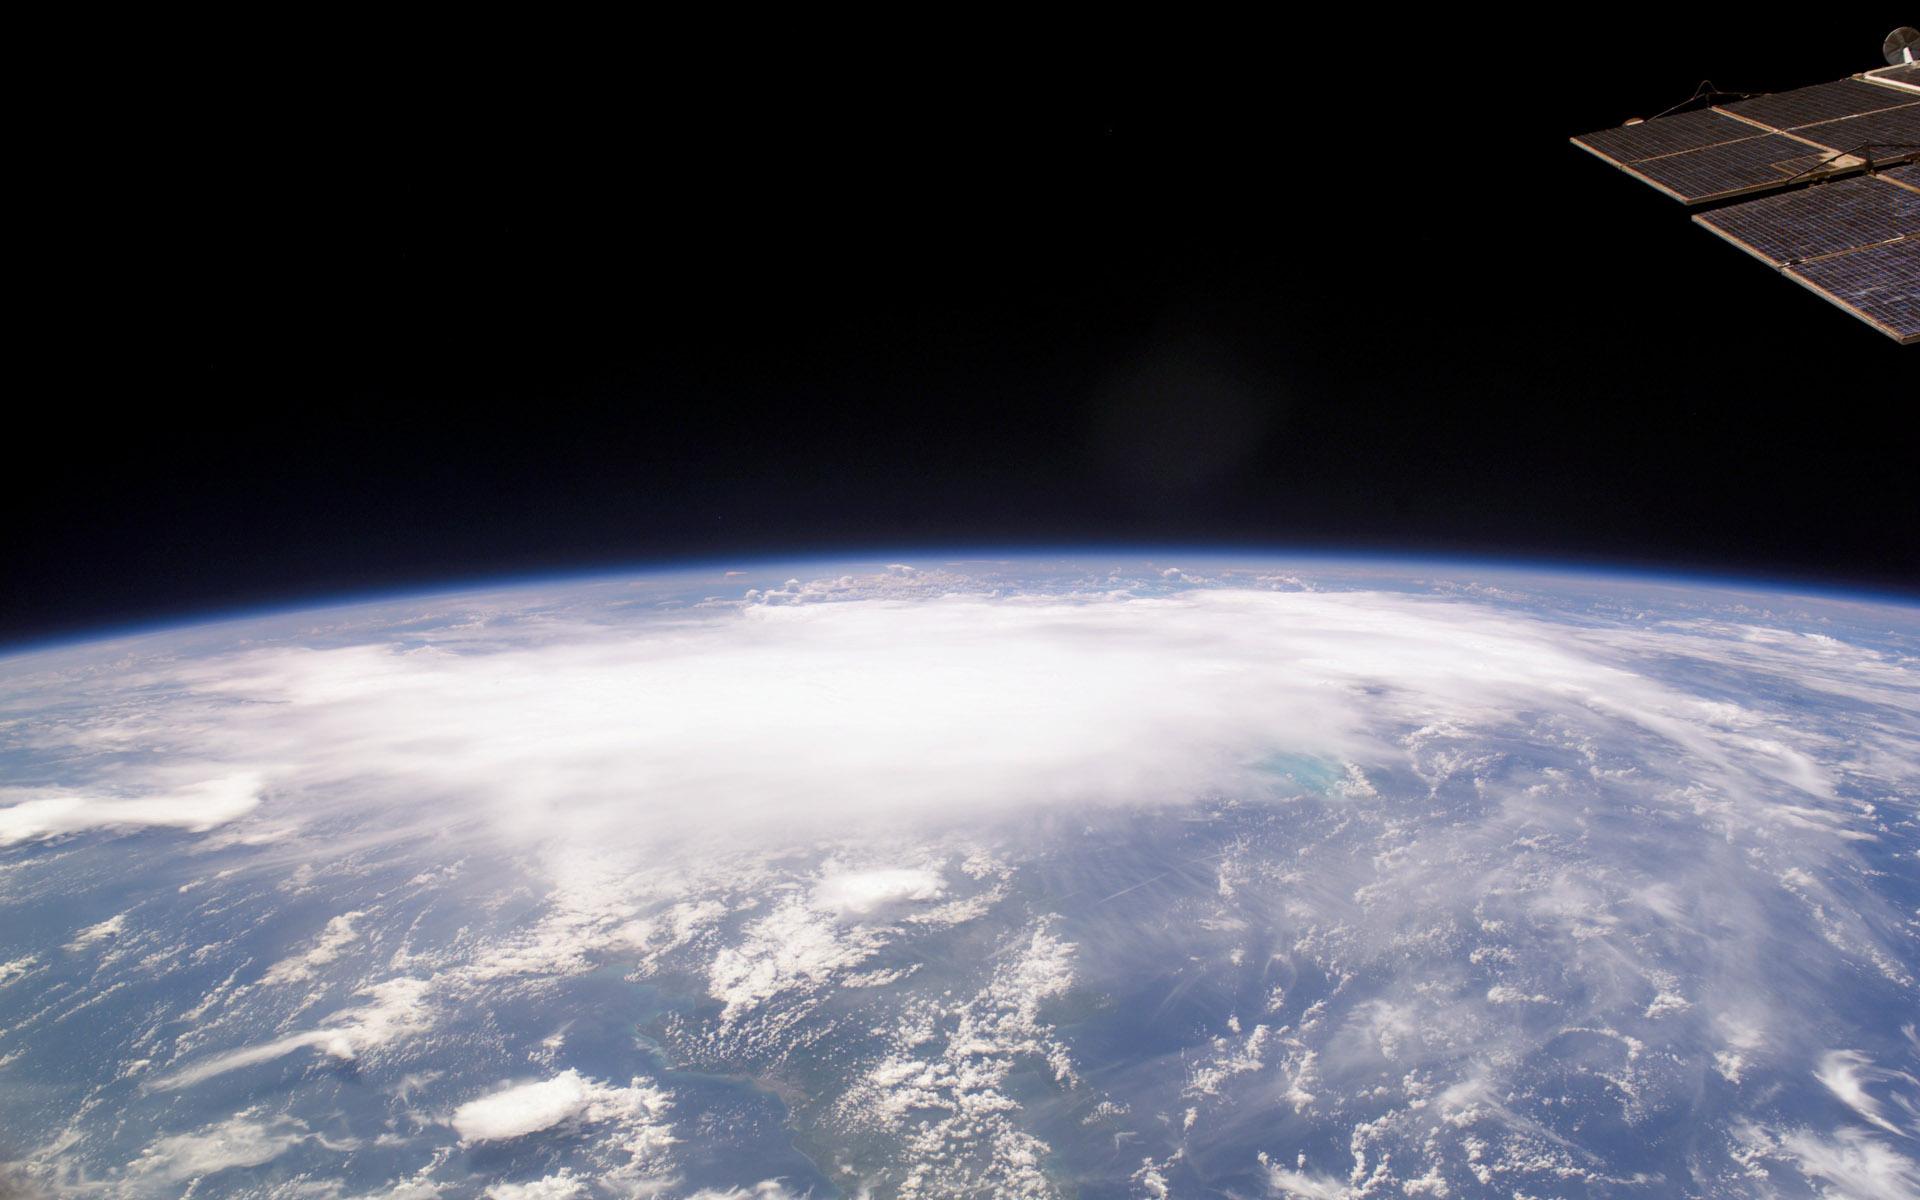 NASA High Definition Images Wallpaper - WallpaperSafari